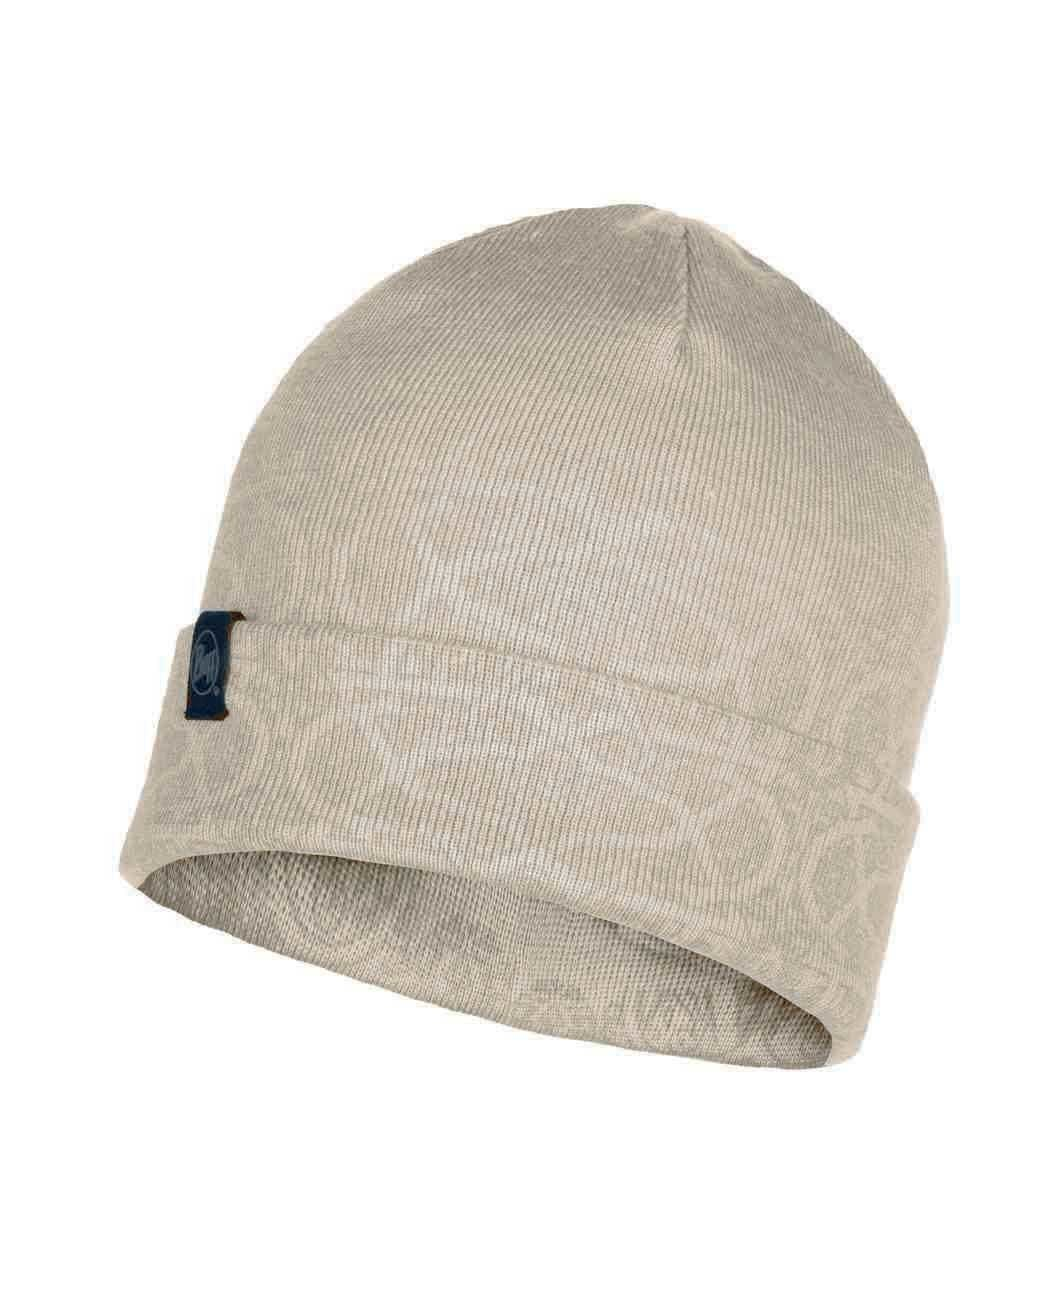 Шапки тонкой вязки Вязаная шапка Buff Hat Knitted Greta Cru 117895.014.10.00.jpg